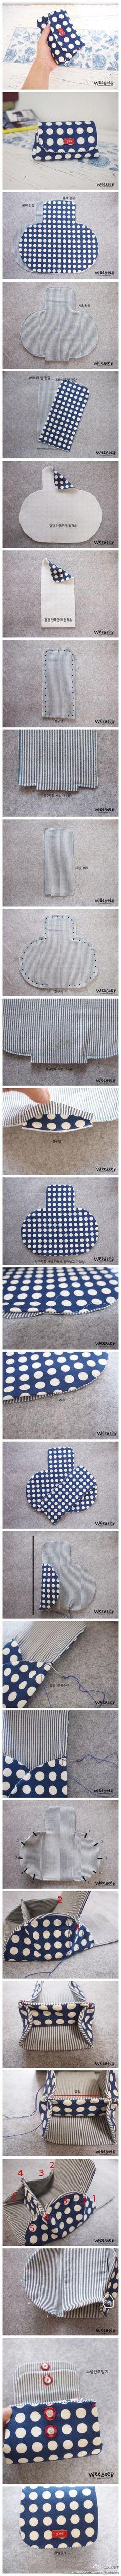 Cloth purse